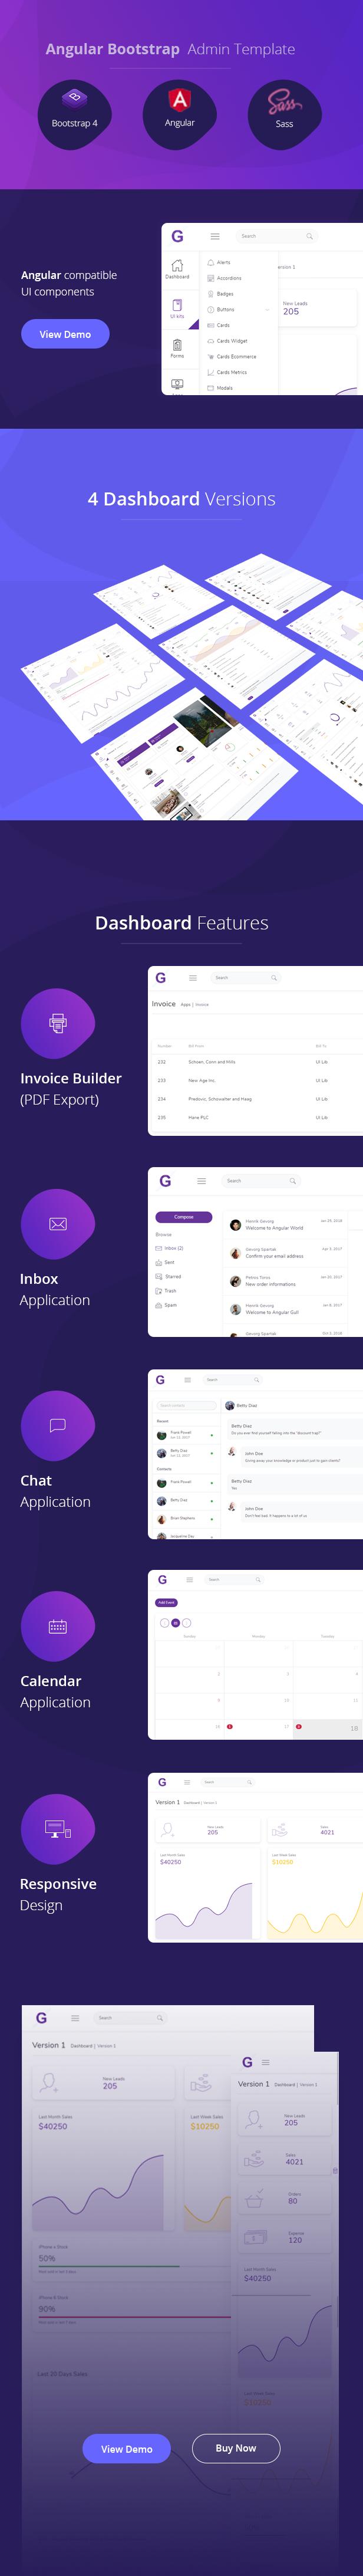 Gull Deshboard Features - Gull - Angular 11+ Bootstrap Admin Dashboard Template